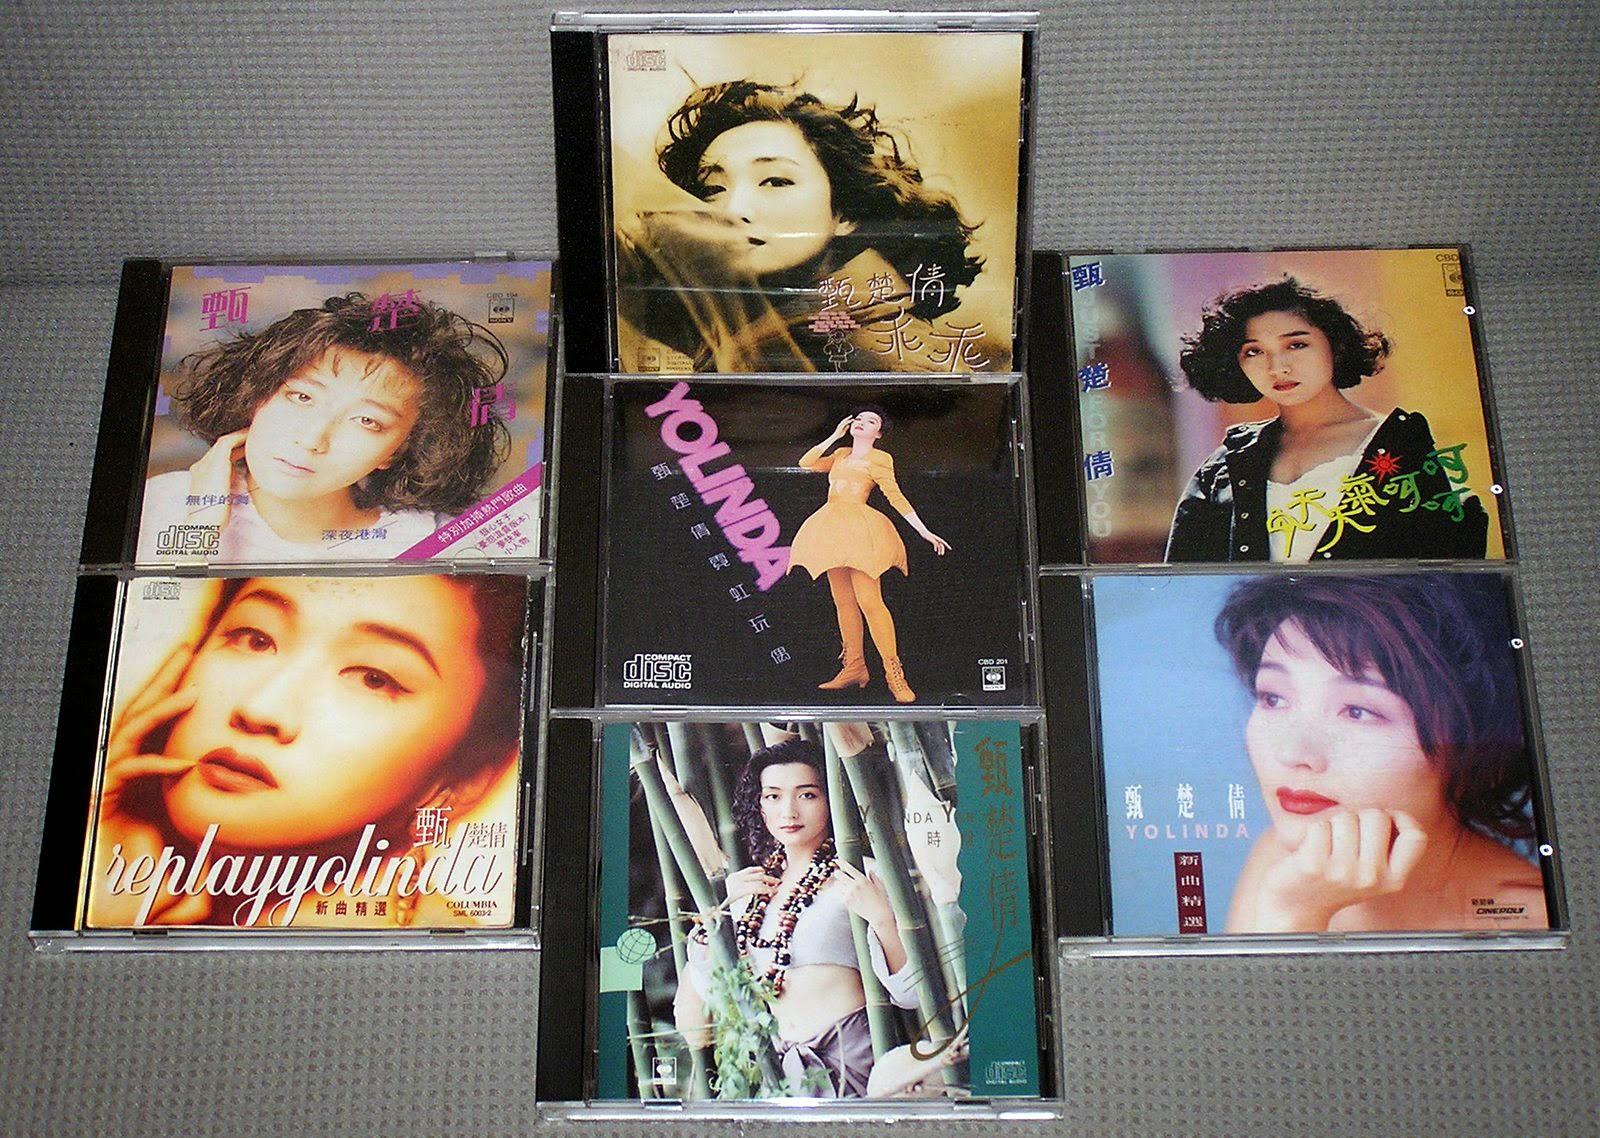 come back to love: 甄楚倩 - 無伴的舞/深夜港灣 CD (1988)